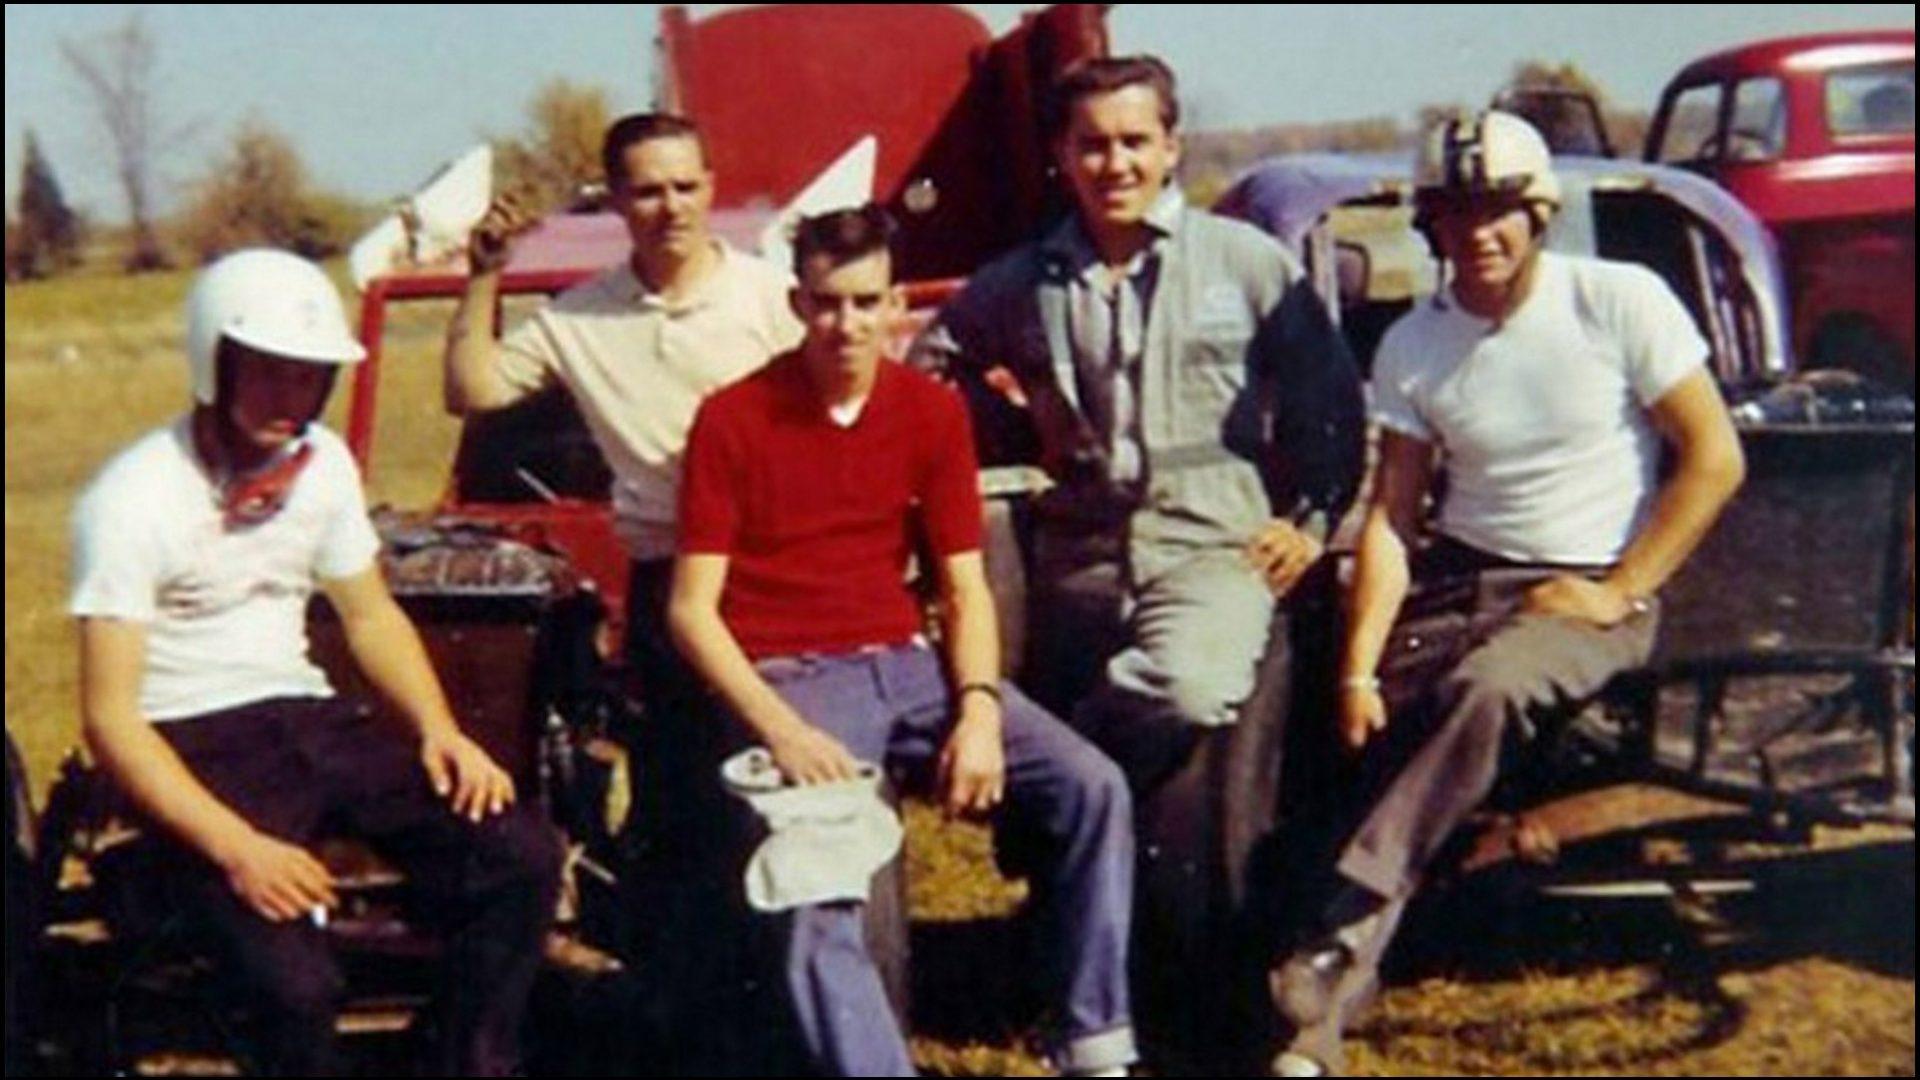 Dick-Mahoney-White-Helmet-Oakley-Sedore-Gib-Paul-Doug-Prior-and-Johnny-Iynas-at-South-Shore-Speedway.-Courtesy-of-Dick-Mahoney.